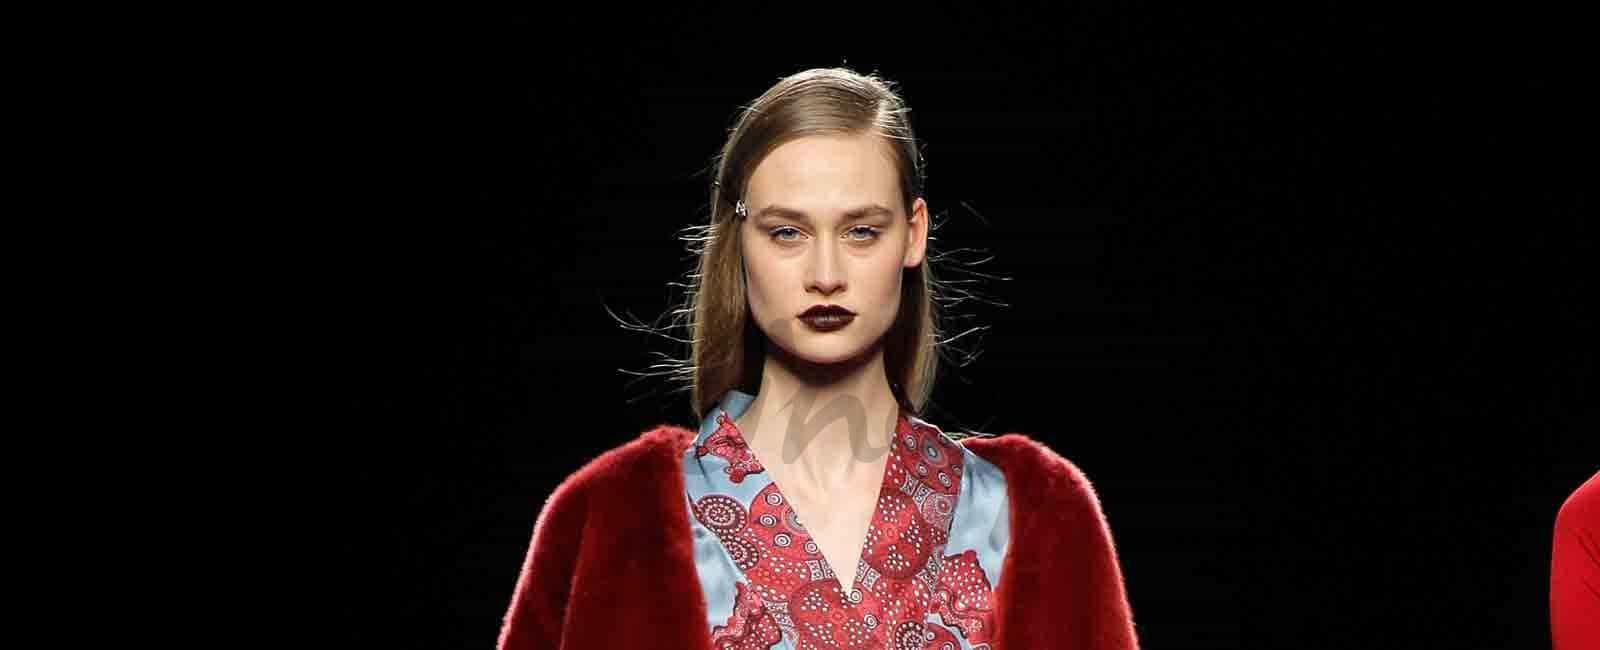 Mercedes Fashion Week: Menchén Tomás Otoño-Invierno 2017/18